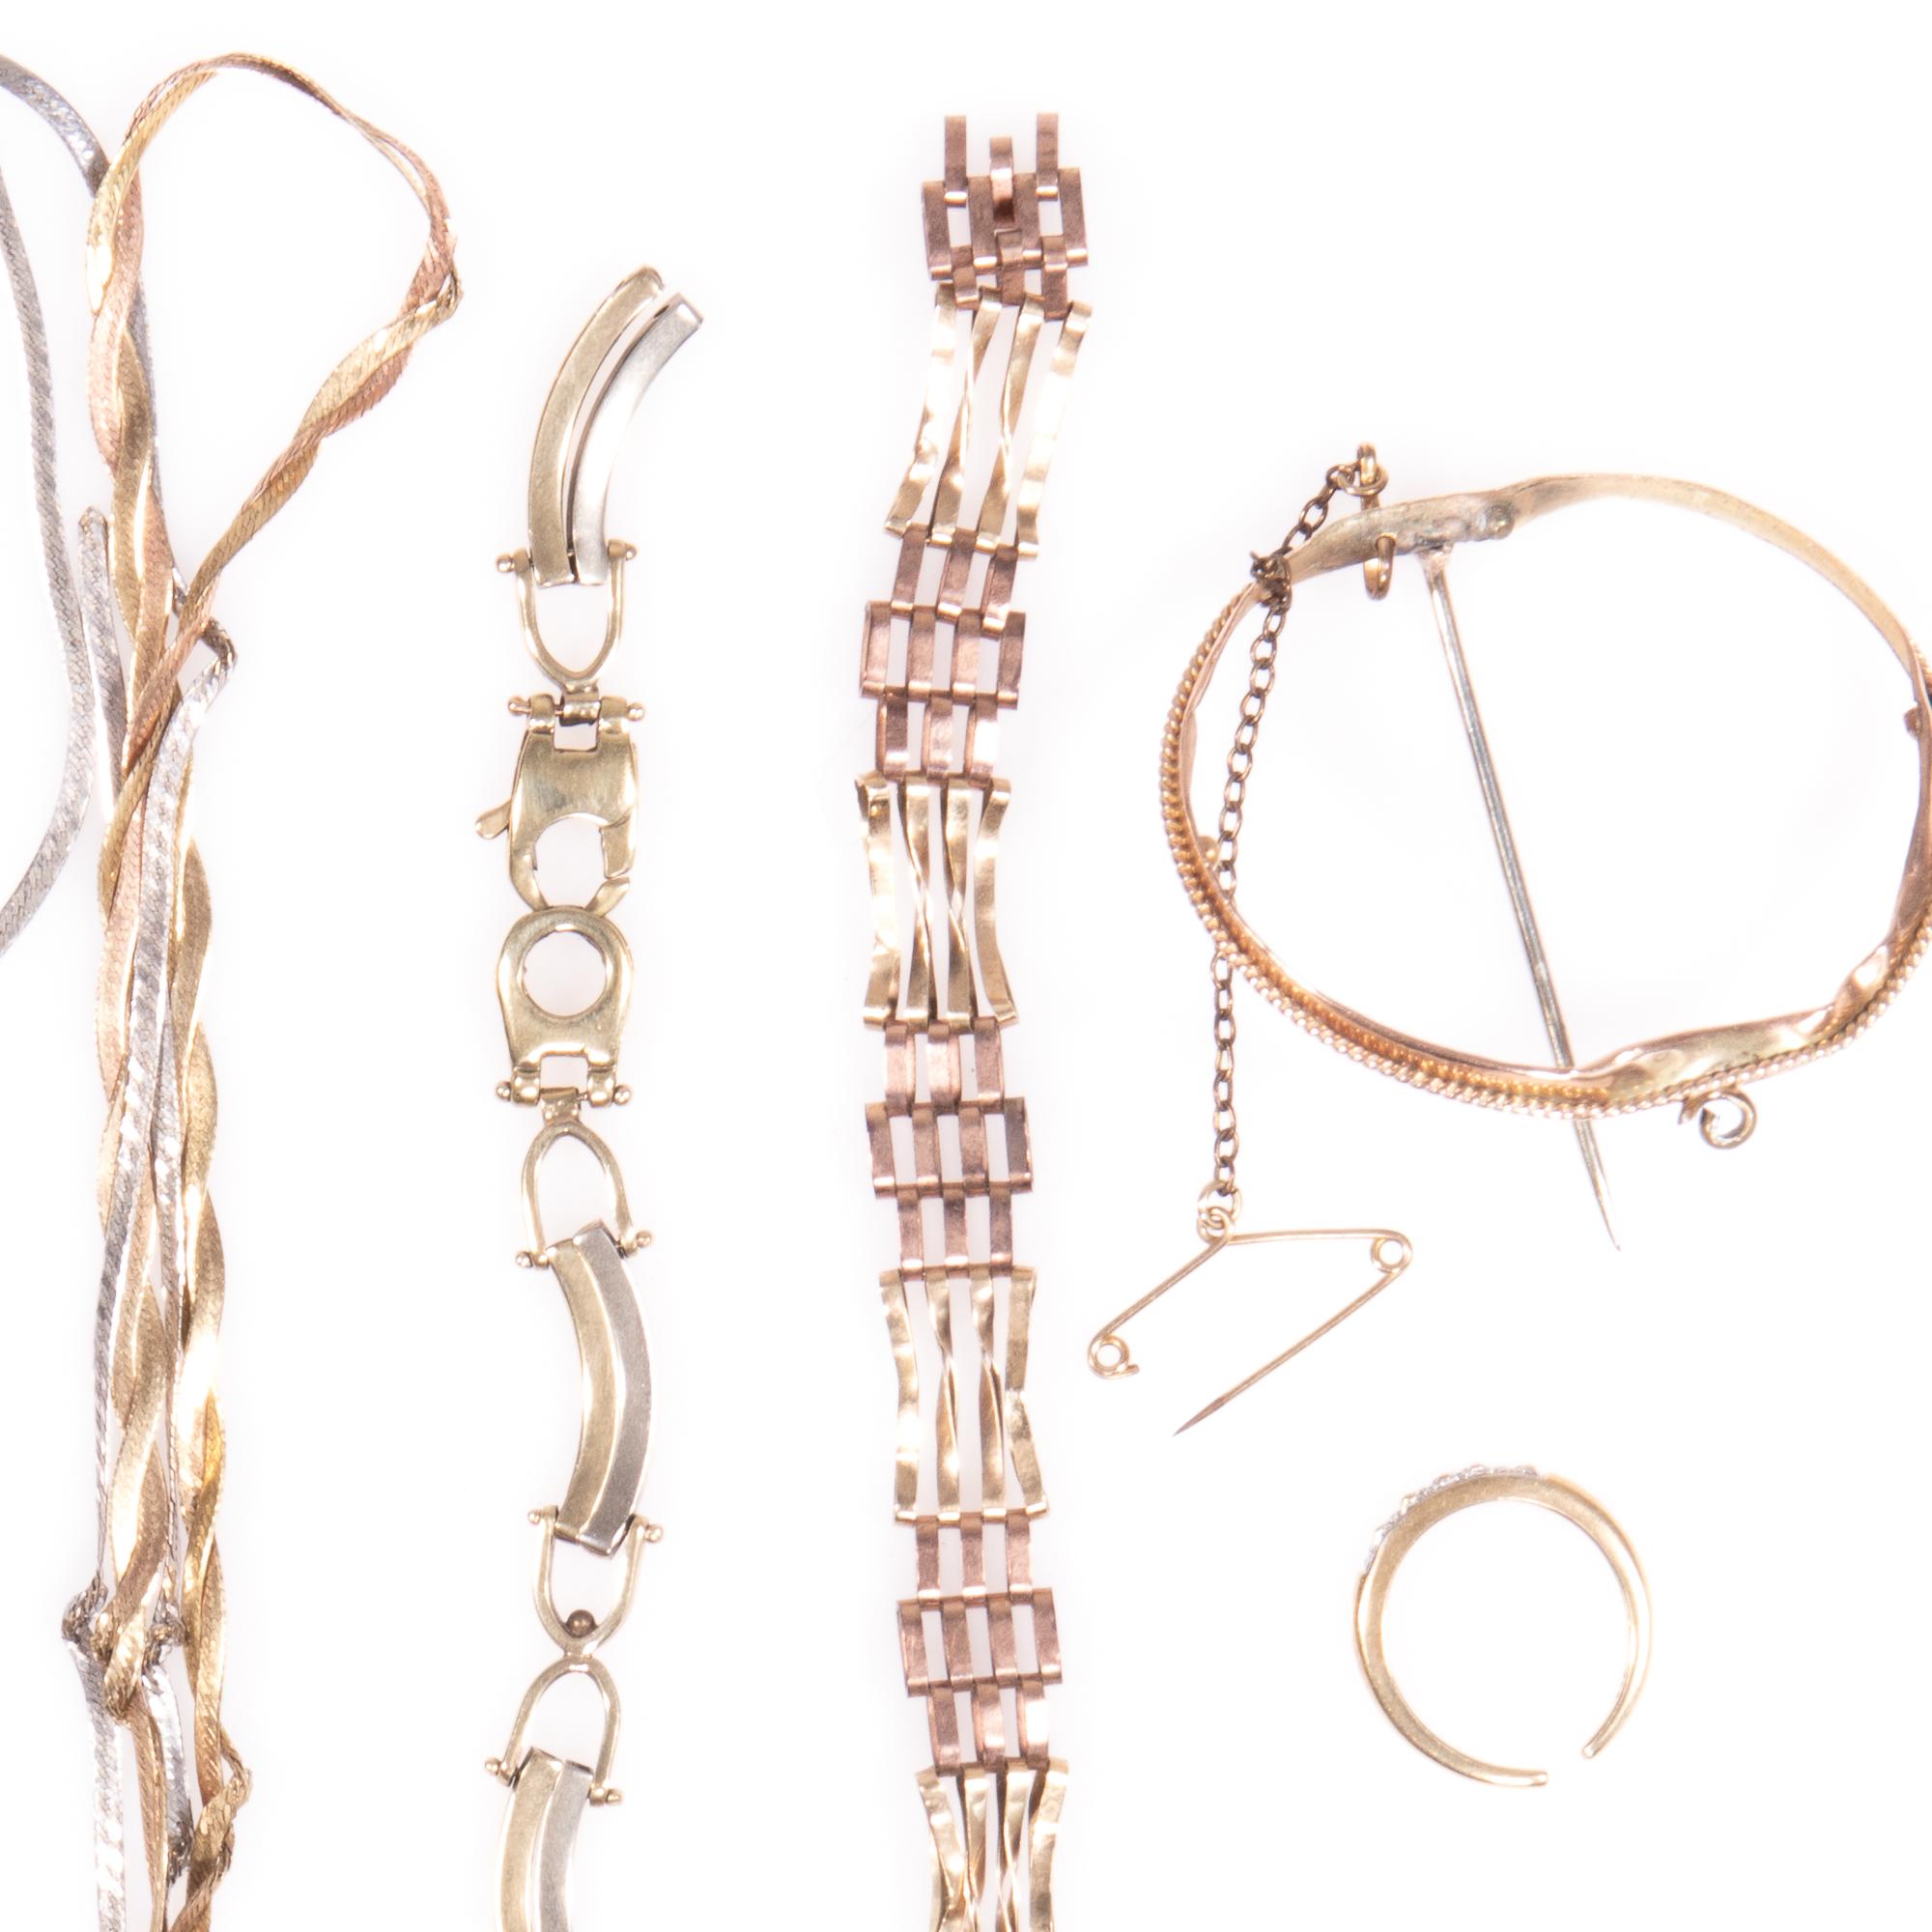 26 grams Scrap Gold Jewellery - Image 3 of 6